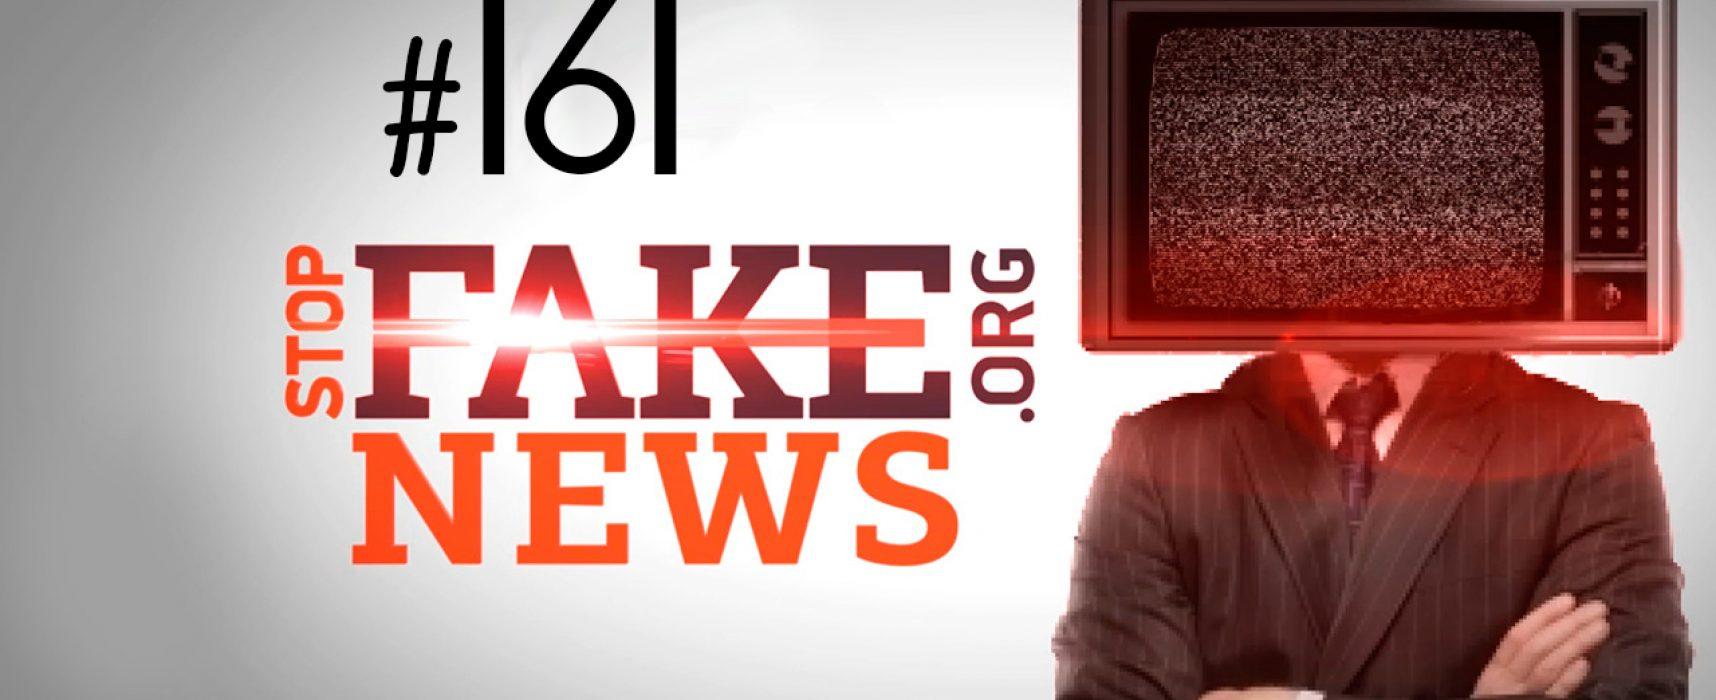 StopFakeNews #161. В СБУ приказали уничтожить улики по Боингу MH17?